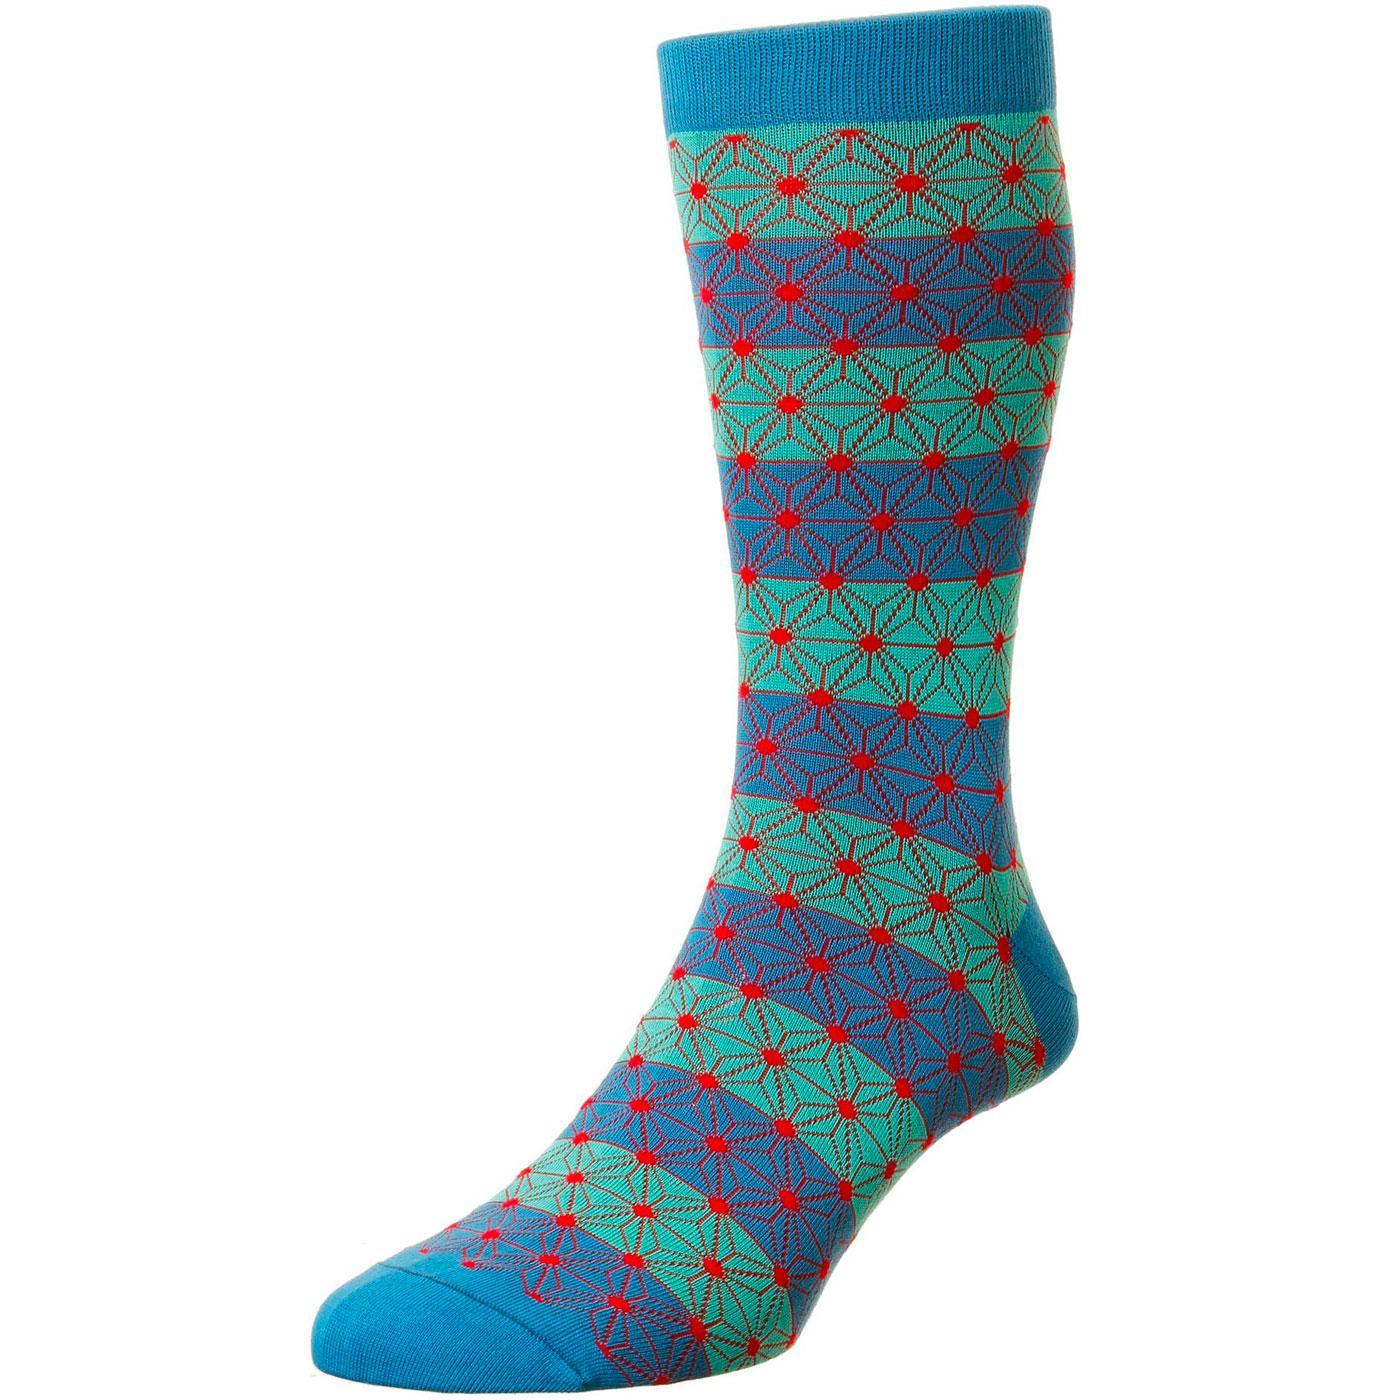 + Asanoha PANTHERELLA Kaleidoscope Spot Socks (PB)